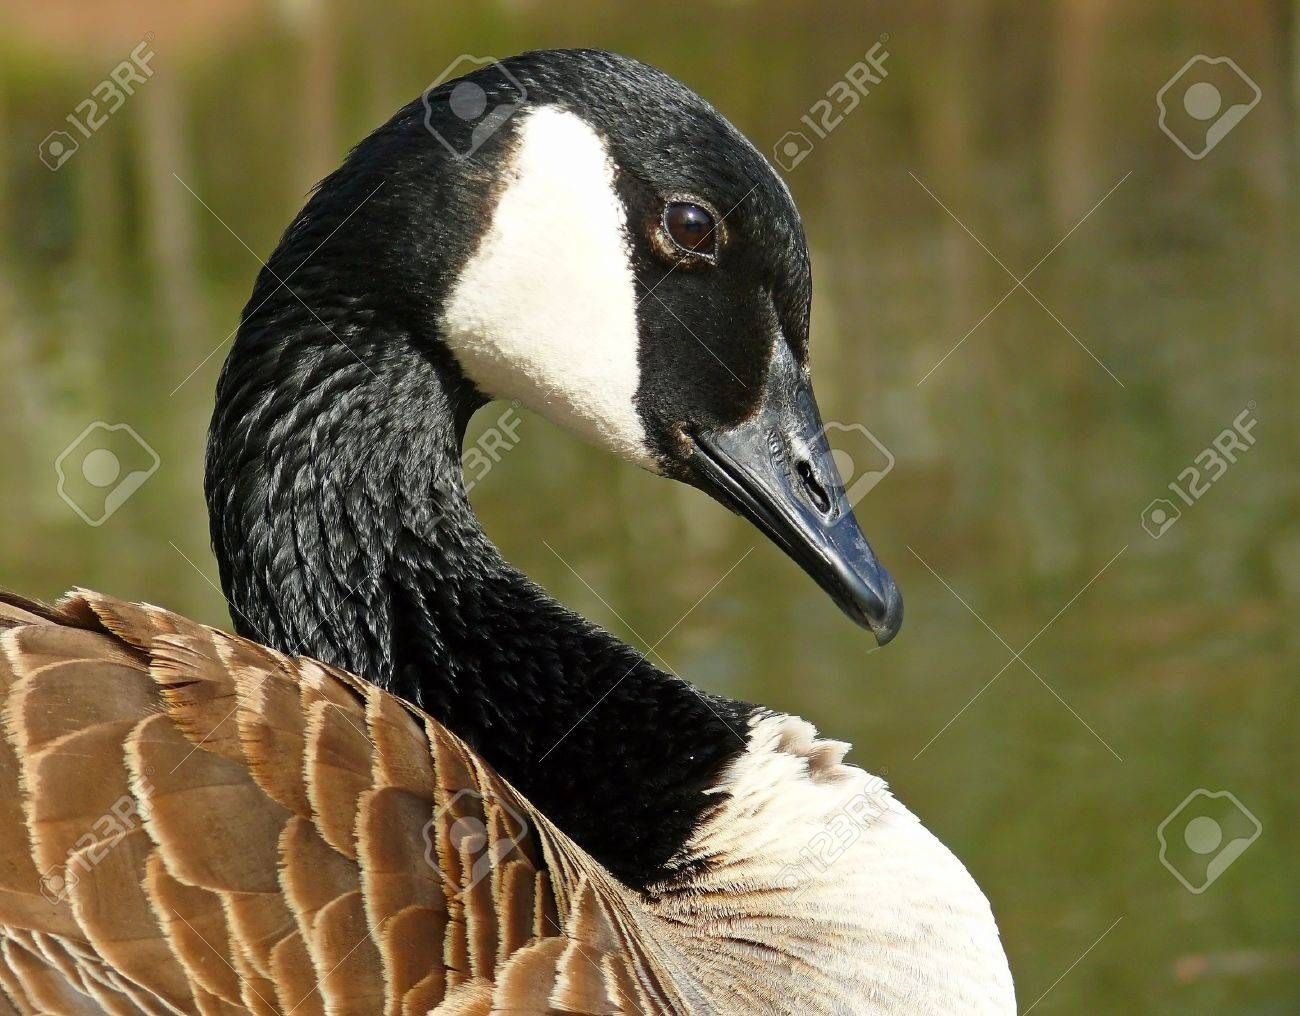 Google Image Result For Https Previews 123rf Com Images Mariedaloia Mariedaloia1203 Mariedaloia120300018 12961251 Canada Goose Face In 2020 Canada Goose Image Goose